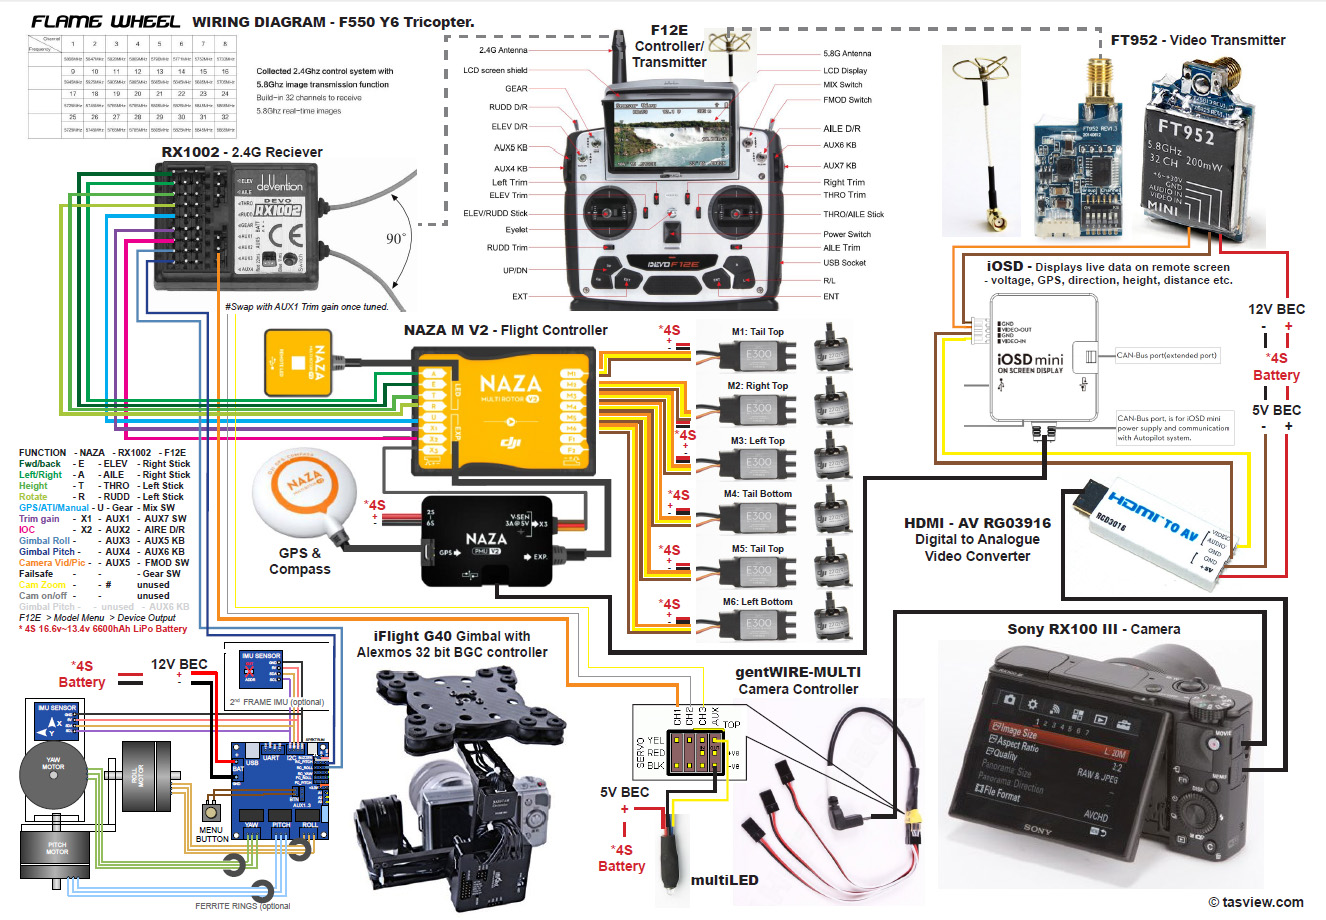 hight resolution of phantom wiring diagram wiring diagram third level gopro wiring diagram dji phantom 2 wiring diagram motor